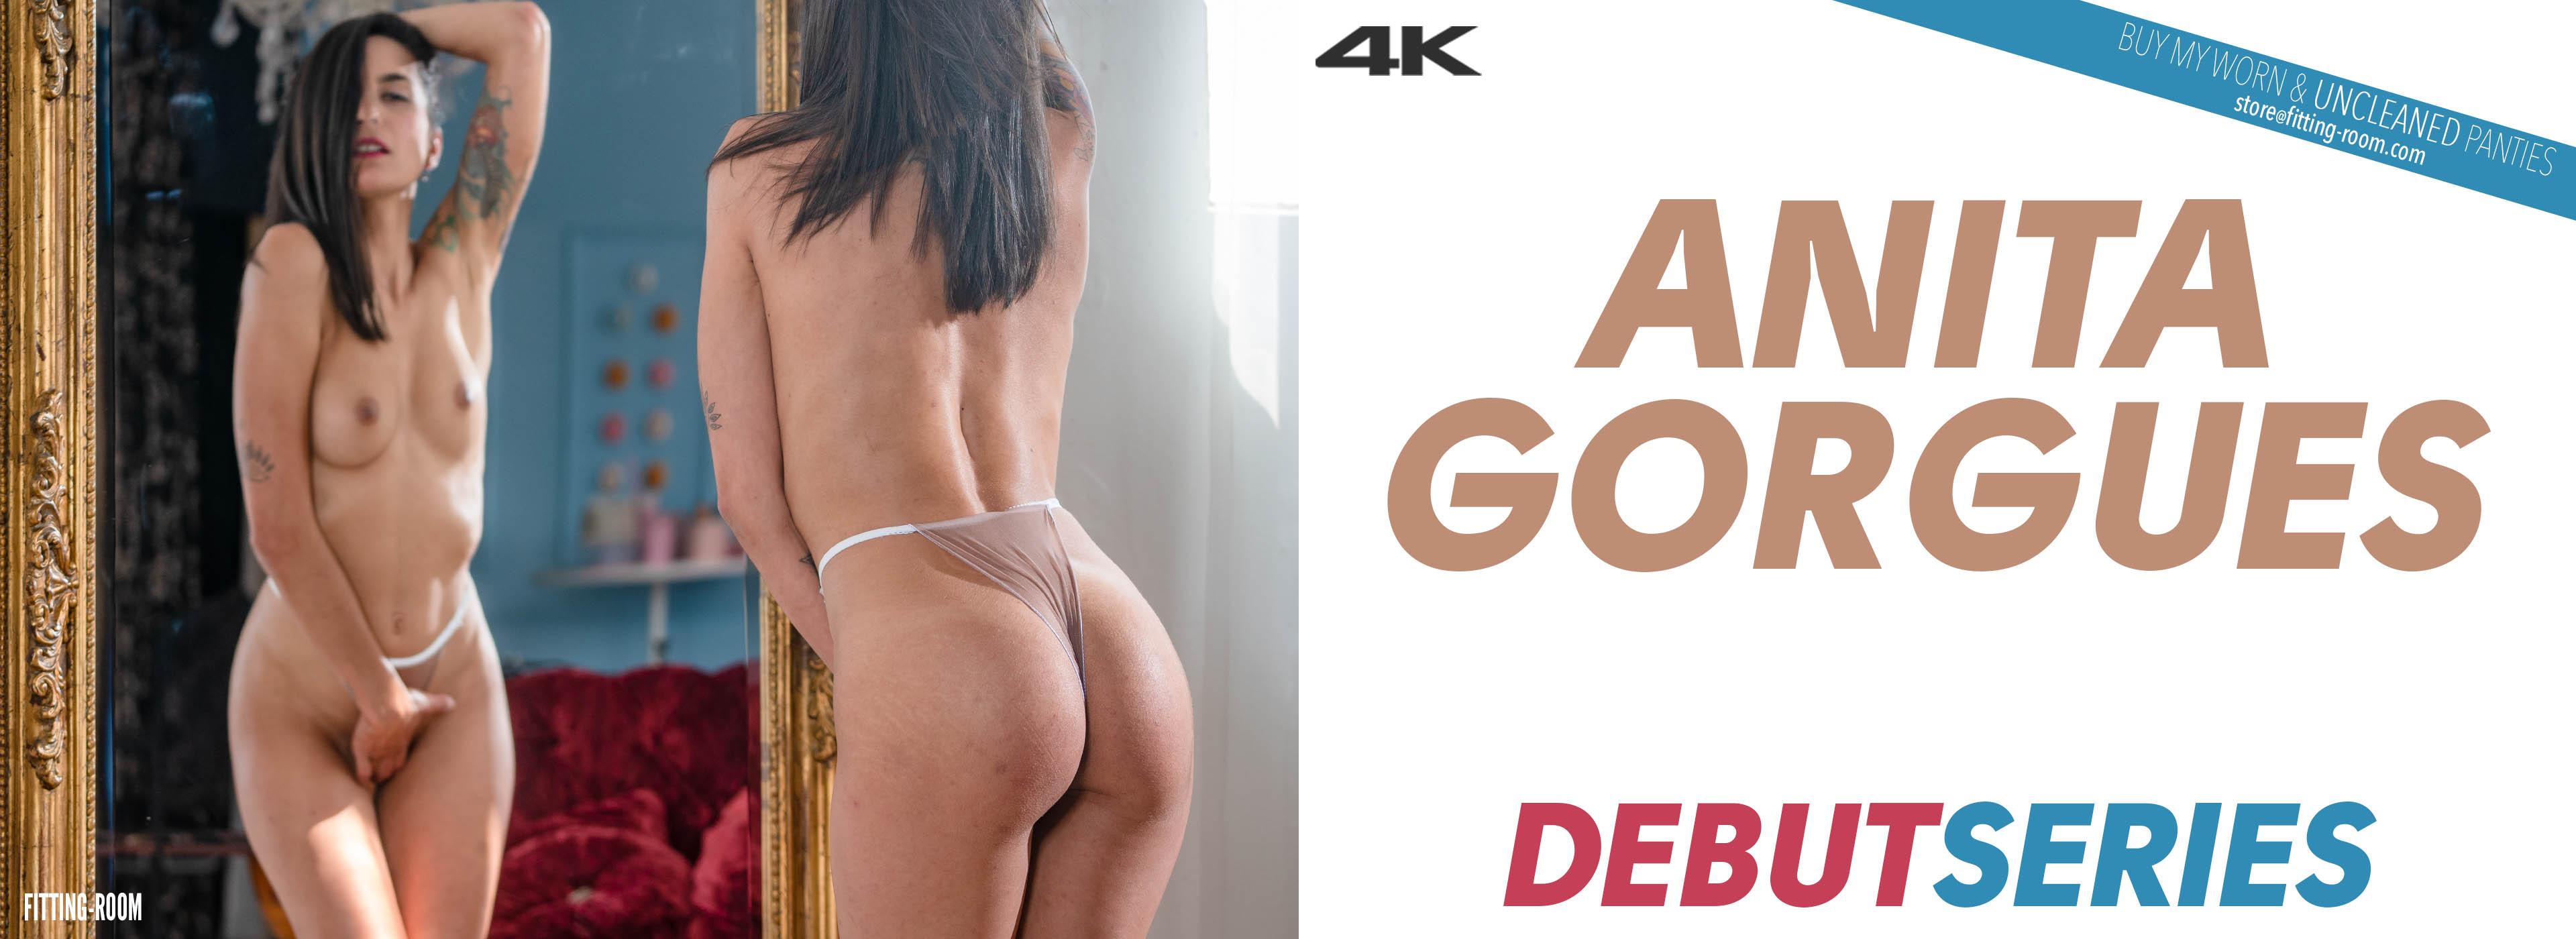 Anita Gorgues   Dressing Code Formal